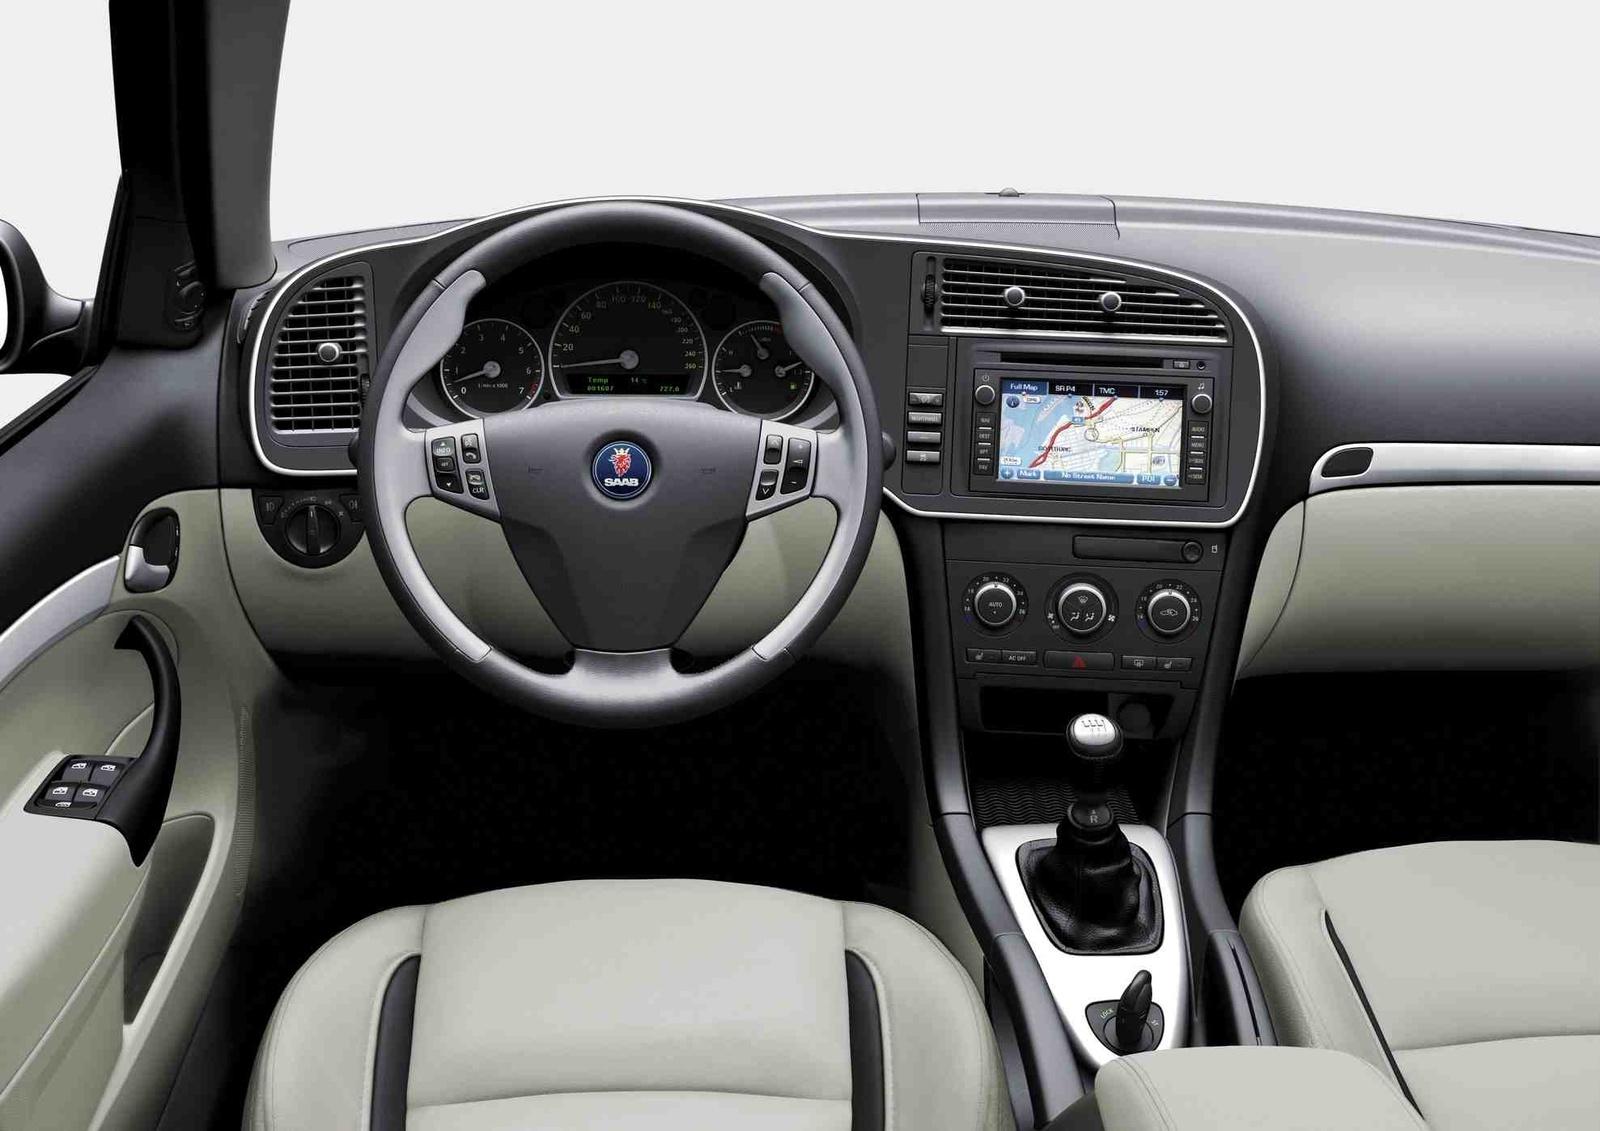 2009 Saab 9-3 Aero, Interior Front Seat View, interior, manufacturer